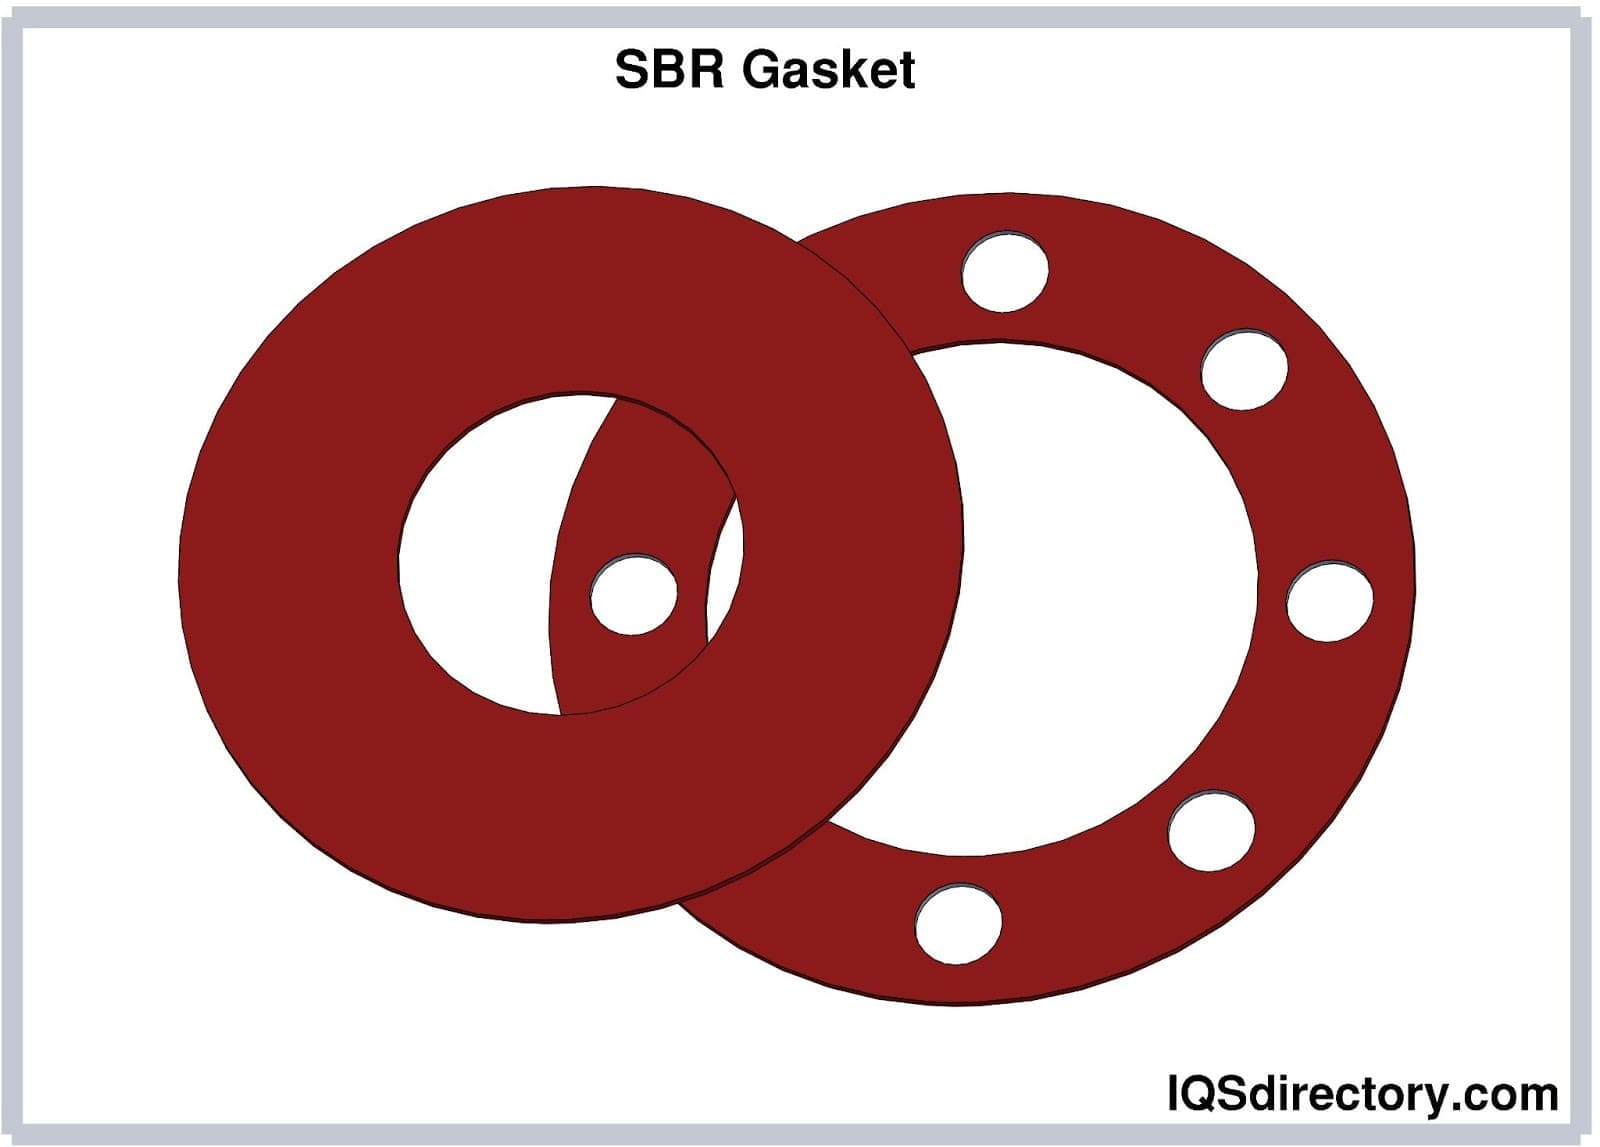 SBR Gasket